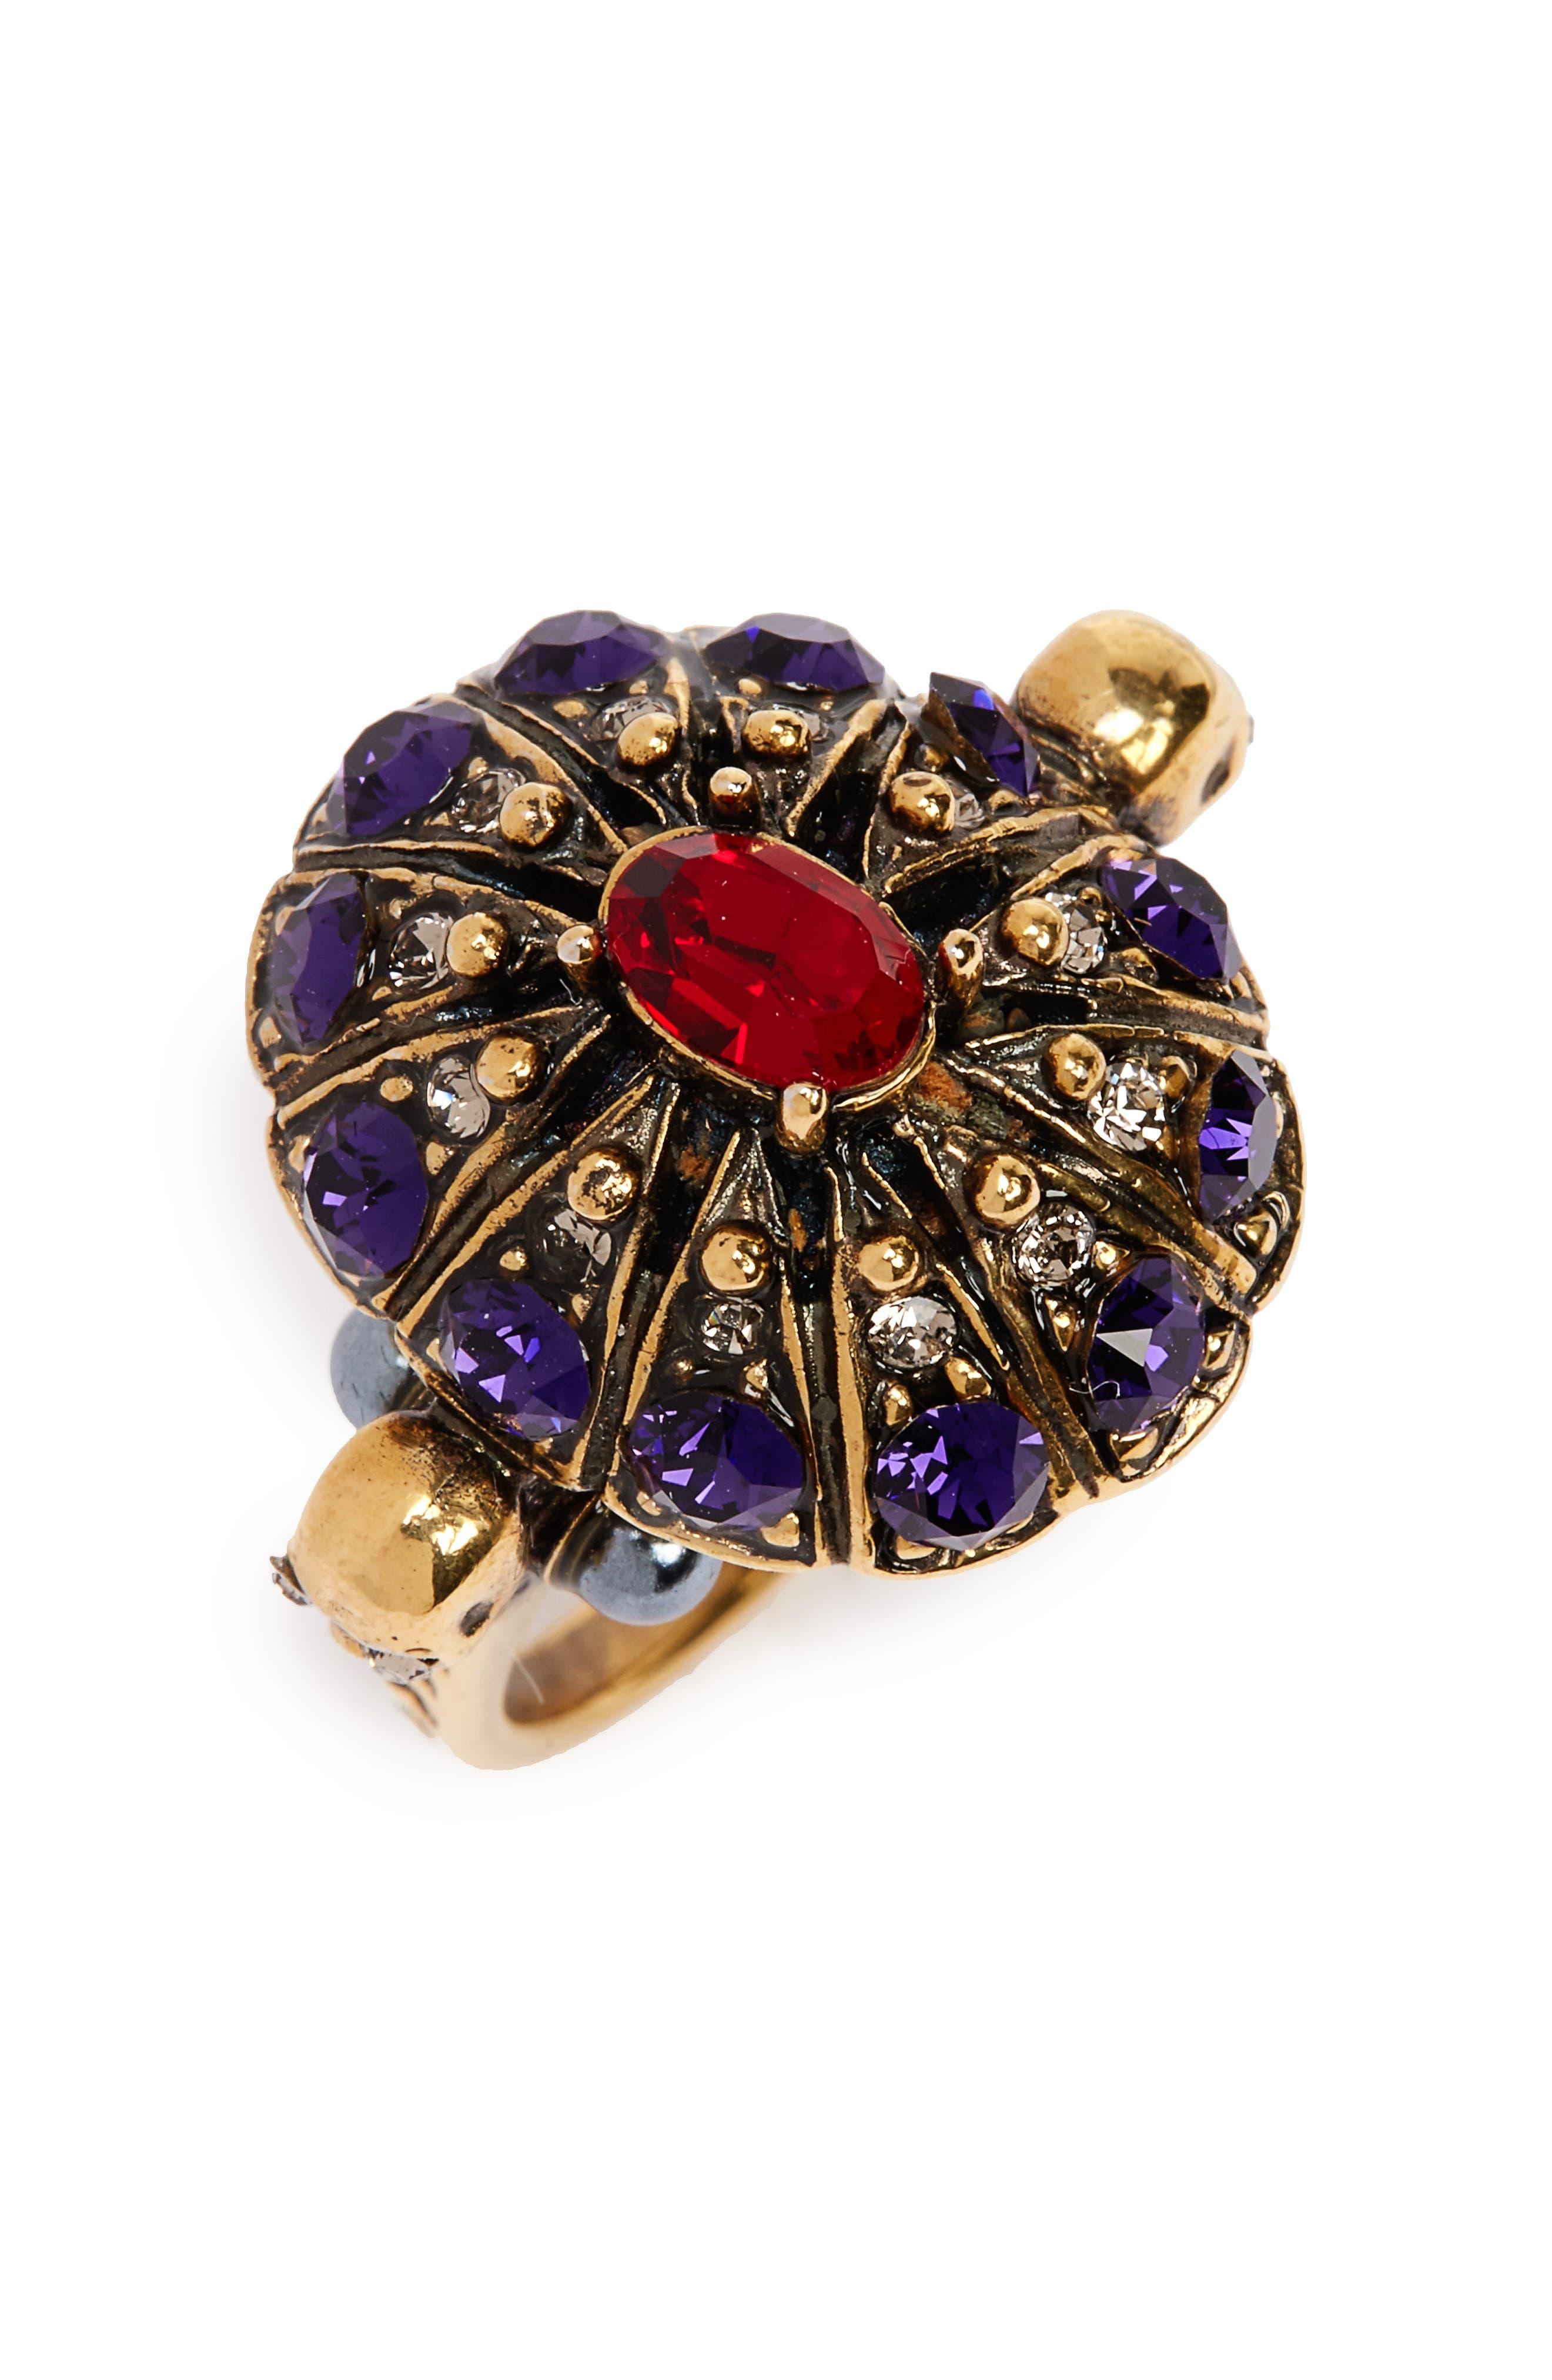 Main Image - Alexander McQueen Swarovski Crystal Ring